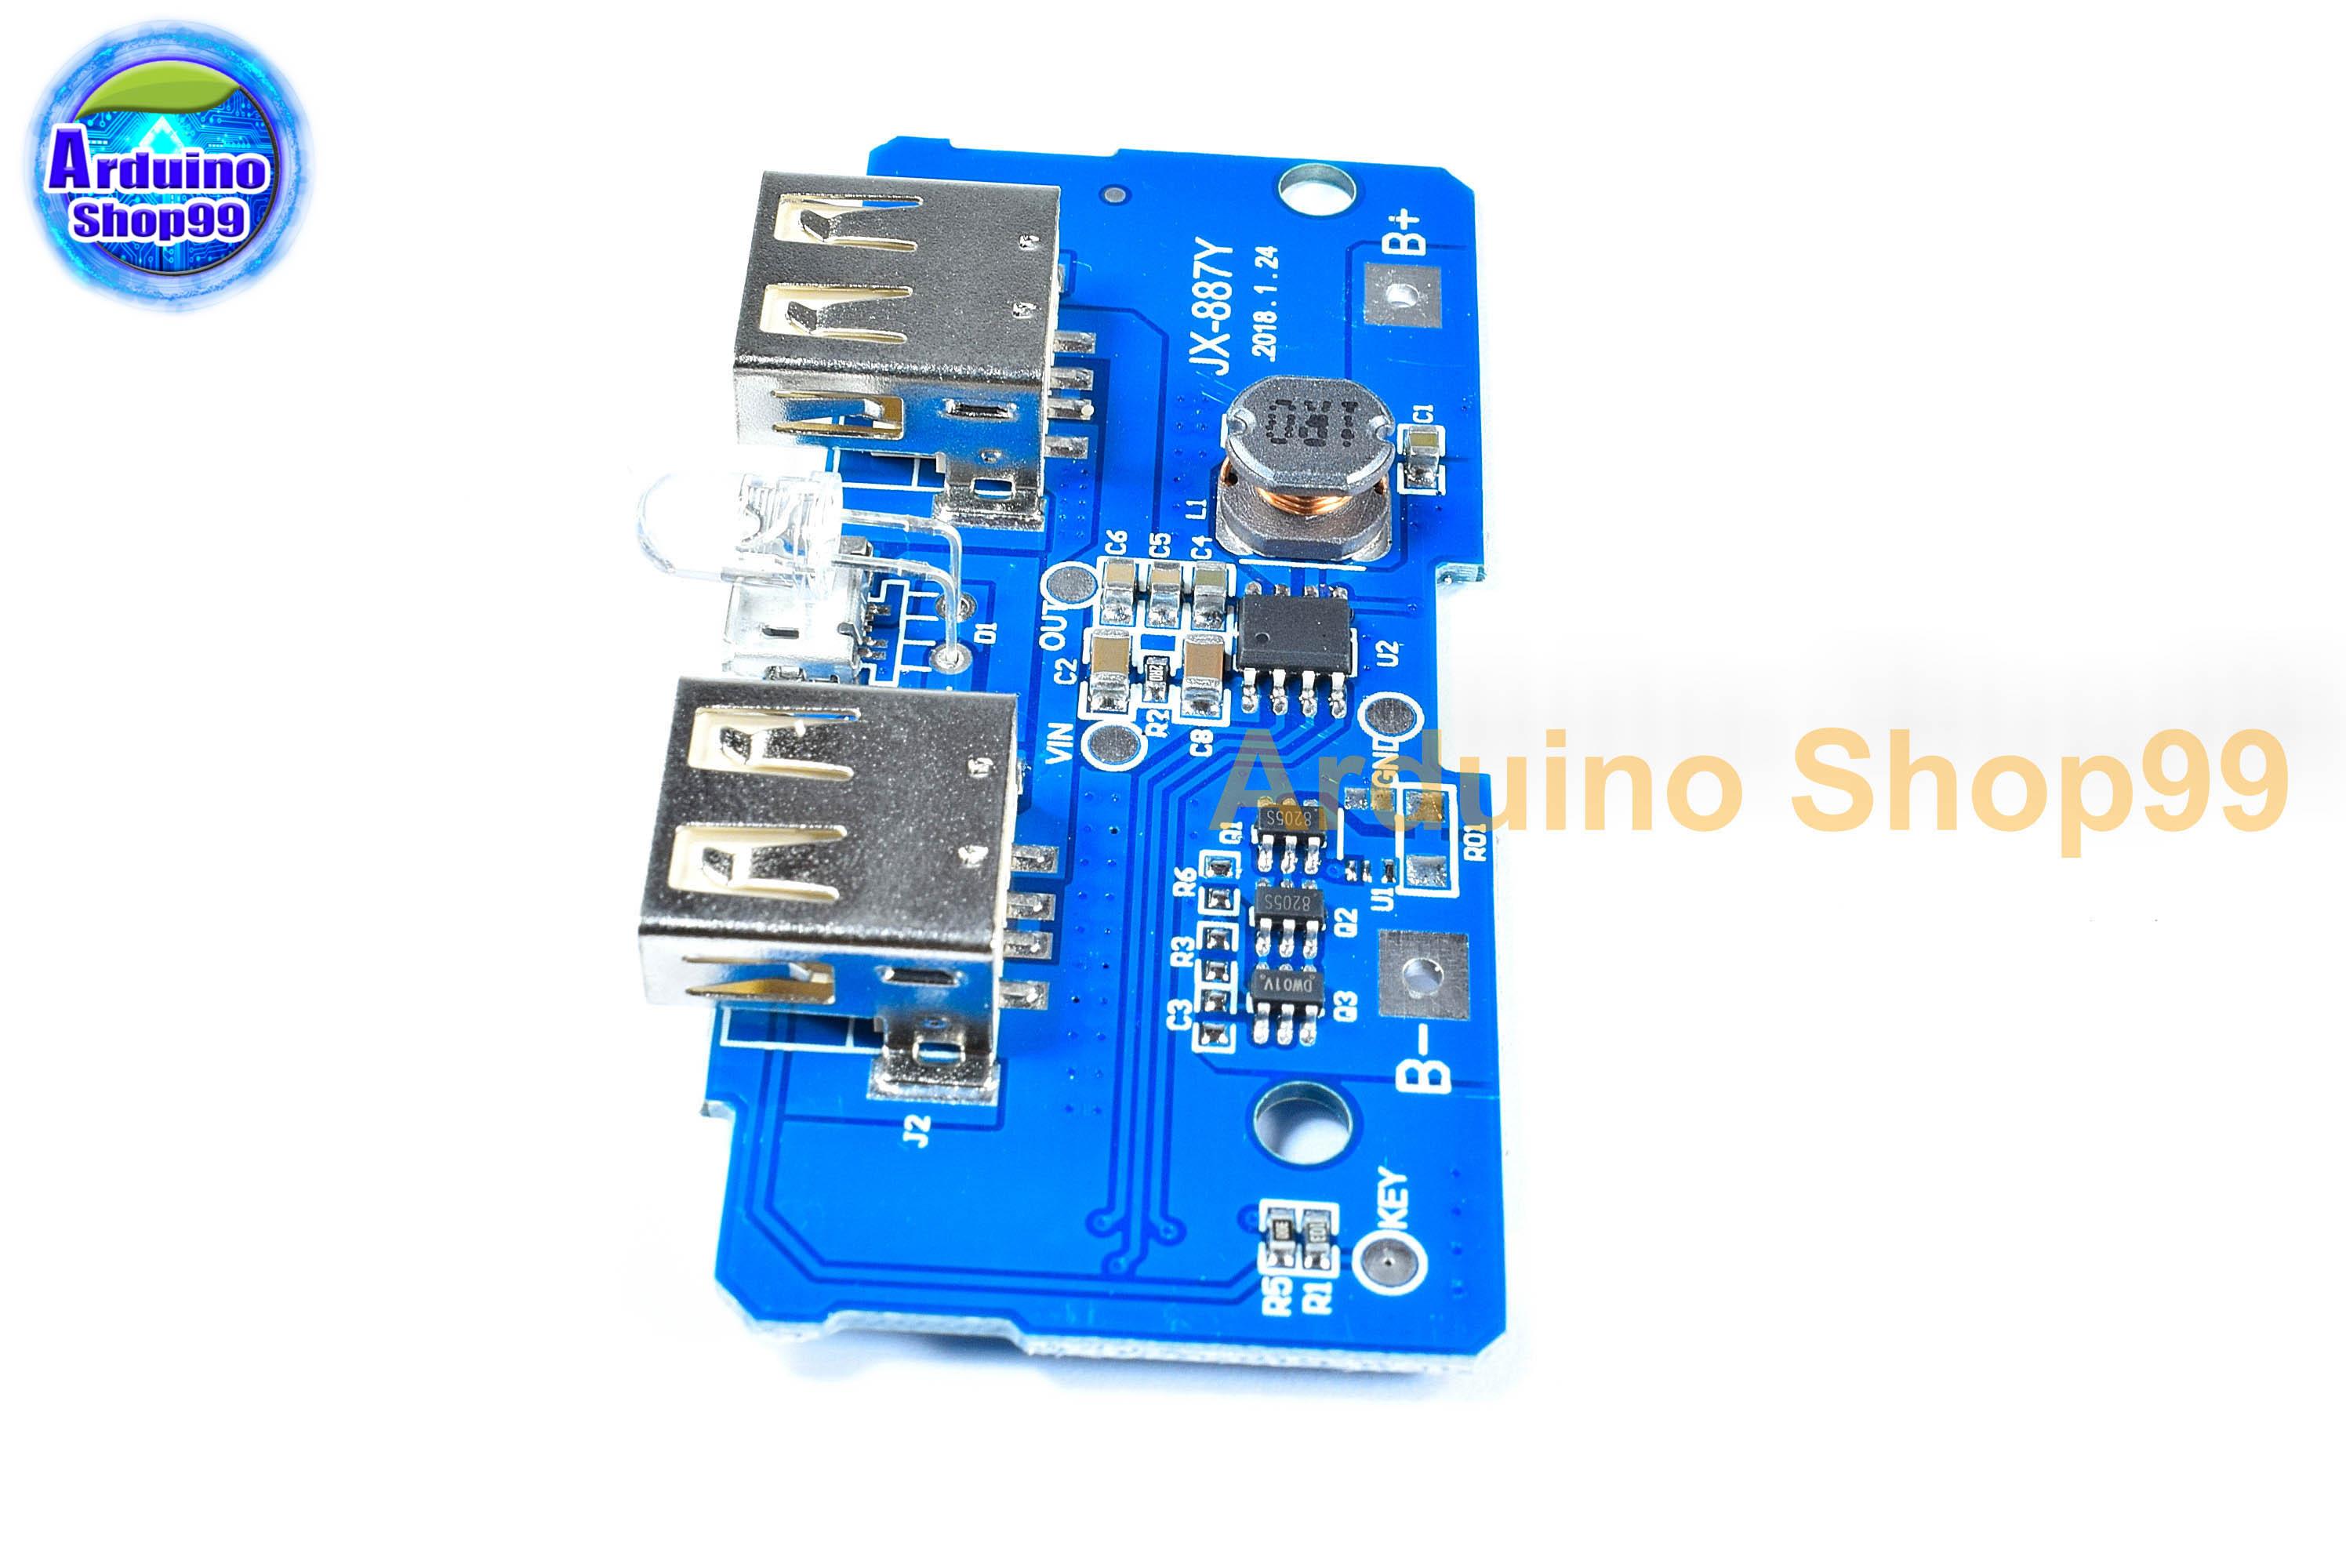 USB Lithium 3.7V Battery Charging Module 4.2V Boost Step Up 5V 9V 12V 24V